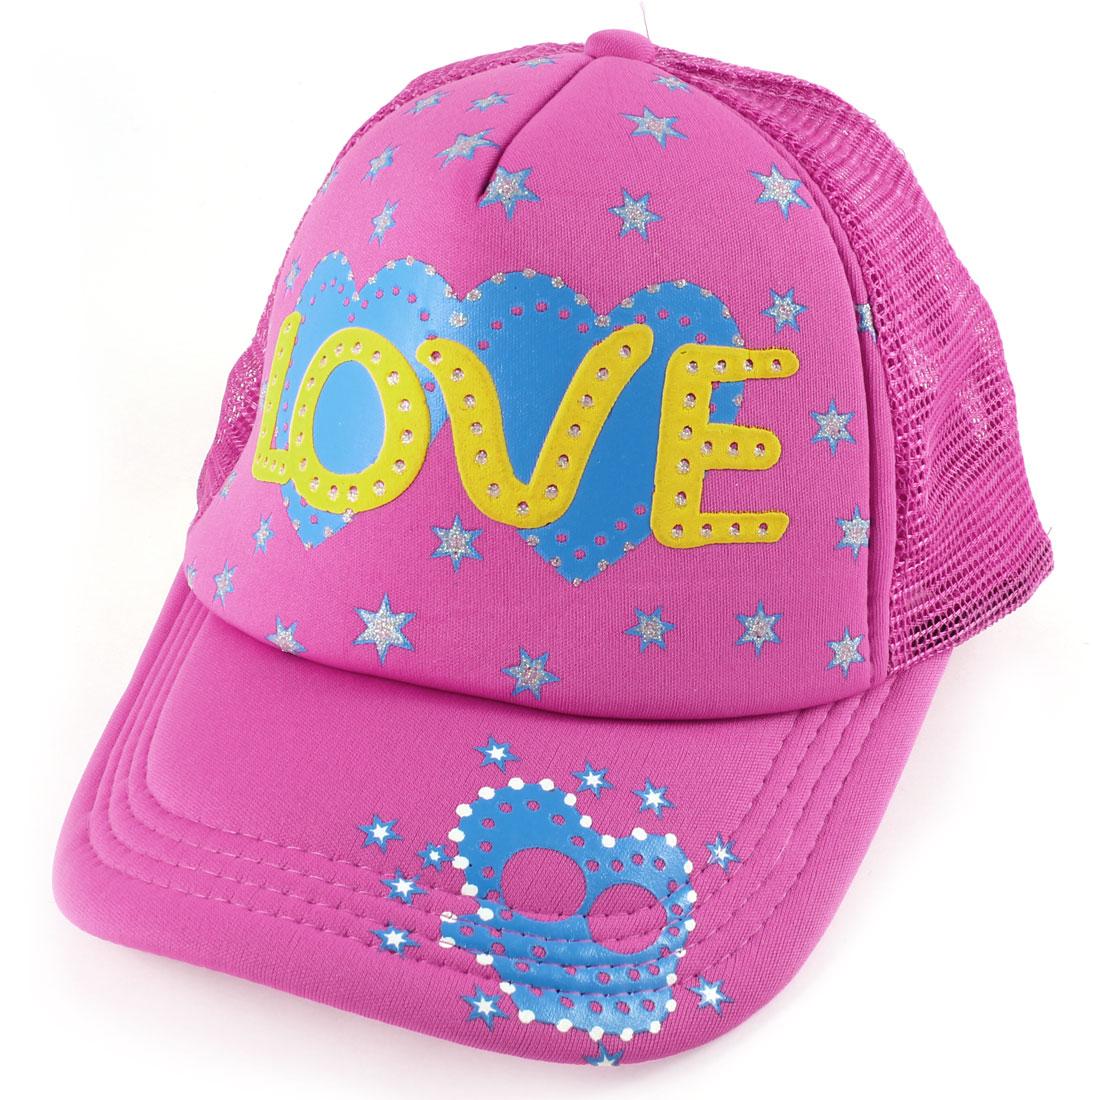 Ladies Blue Fuchsia Pentagram Pattern Adjustable Mesh Back Sports Sun Visor Cap Hat